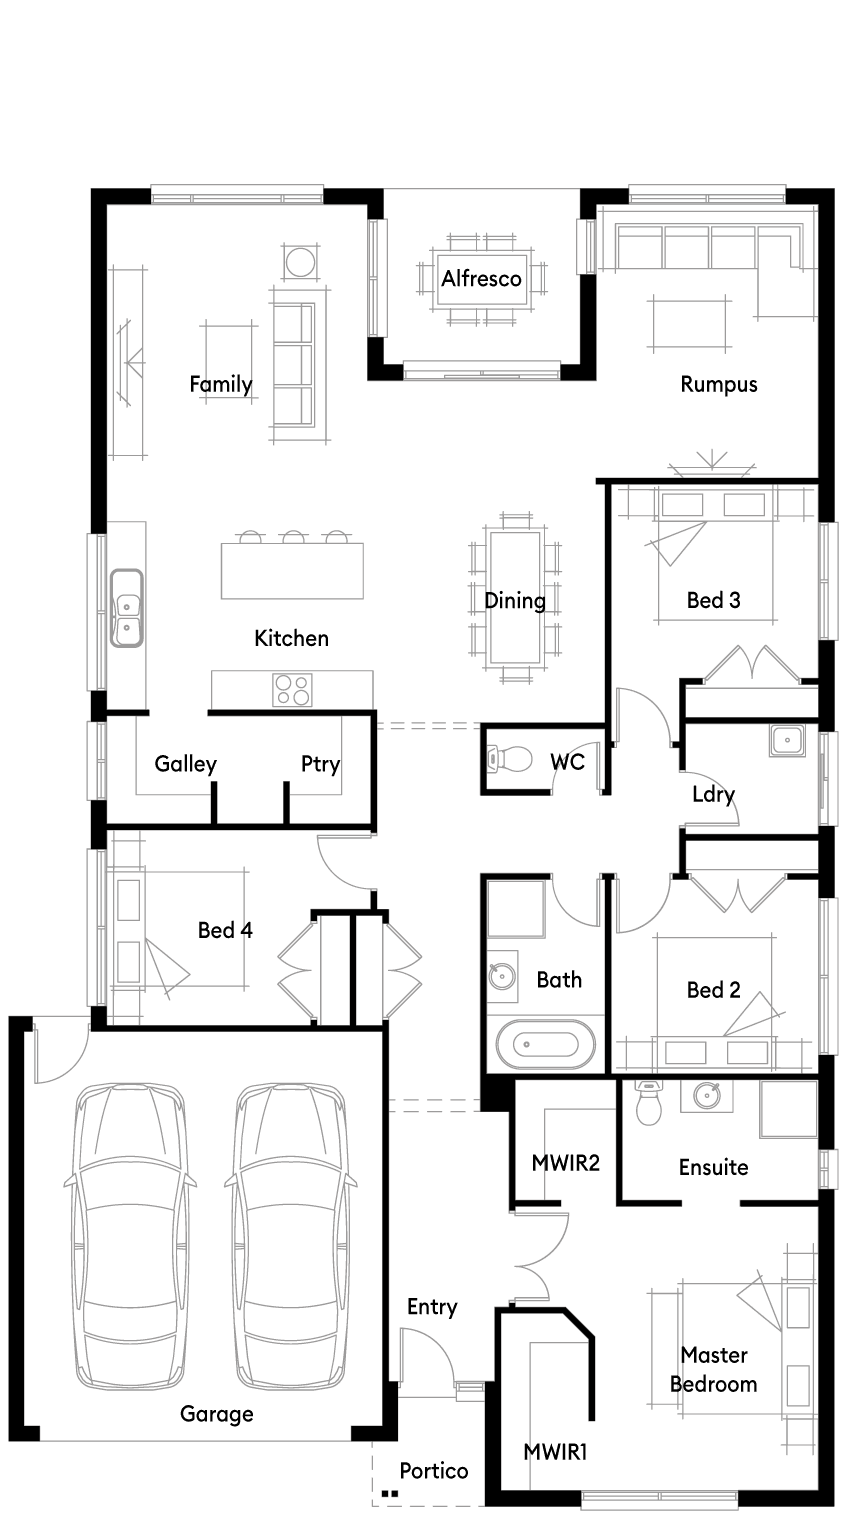 FloorPlan1_HOUSE761_Liverpool_25-13